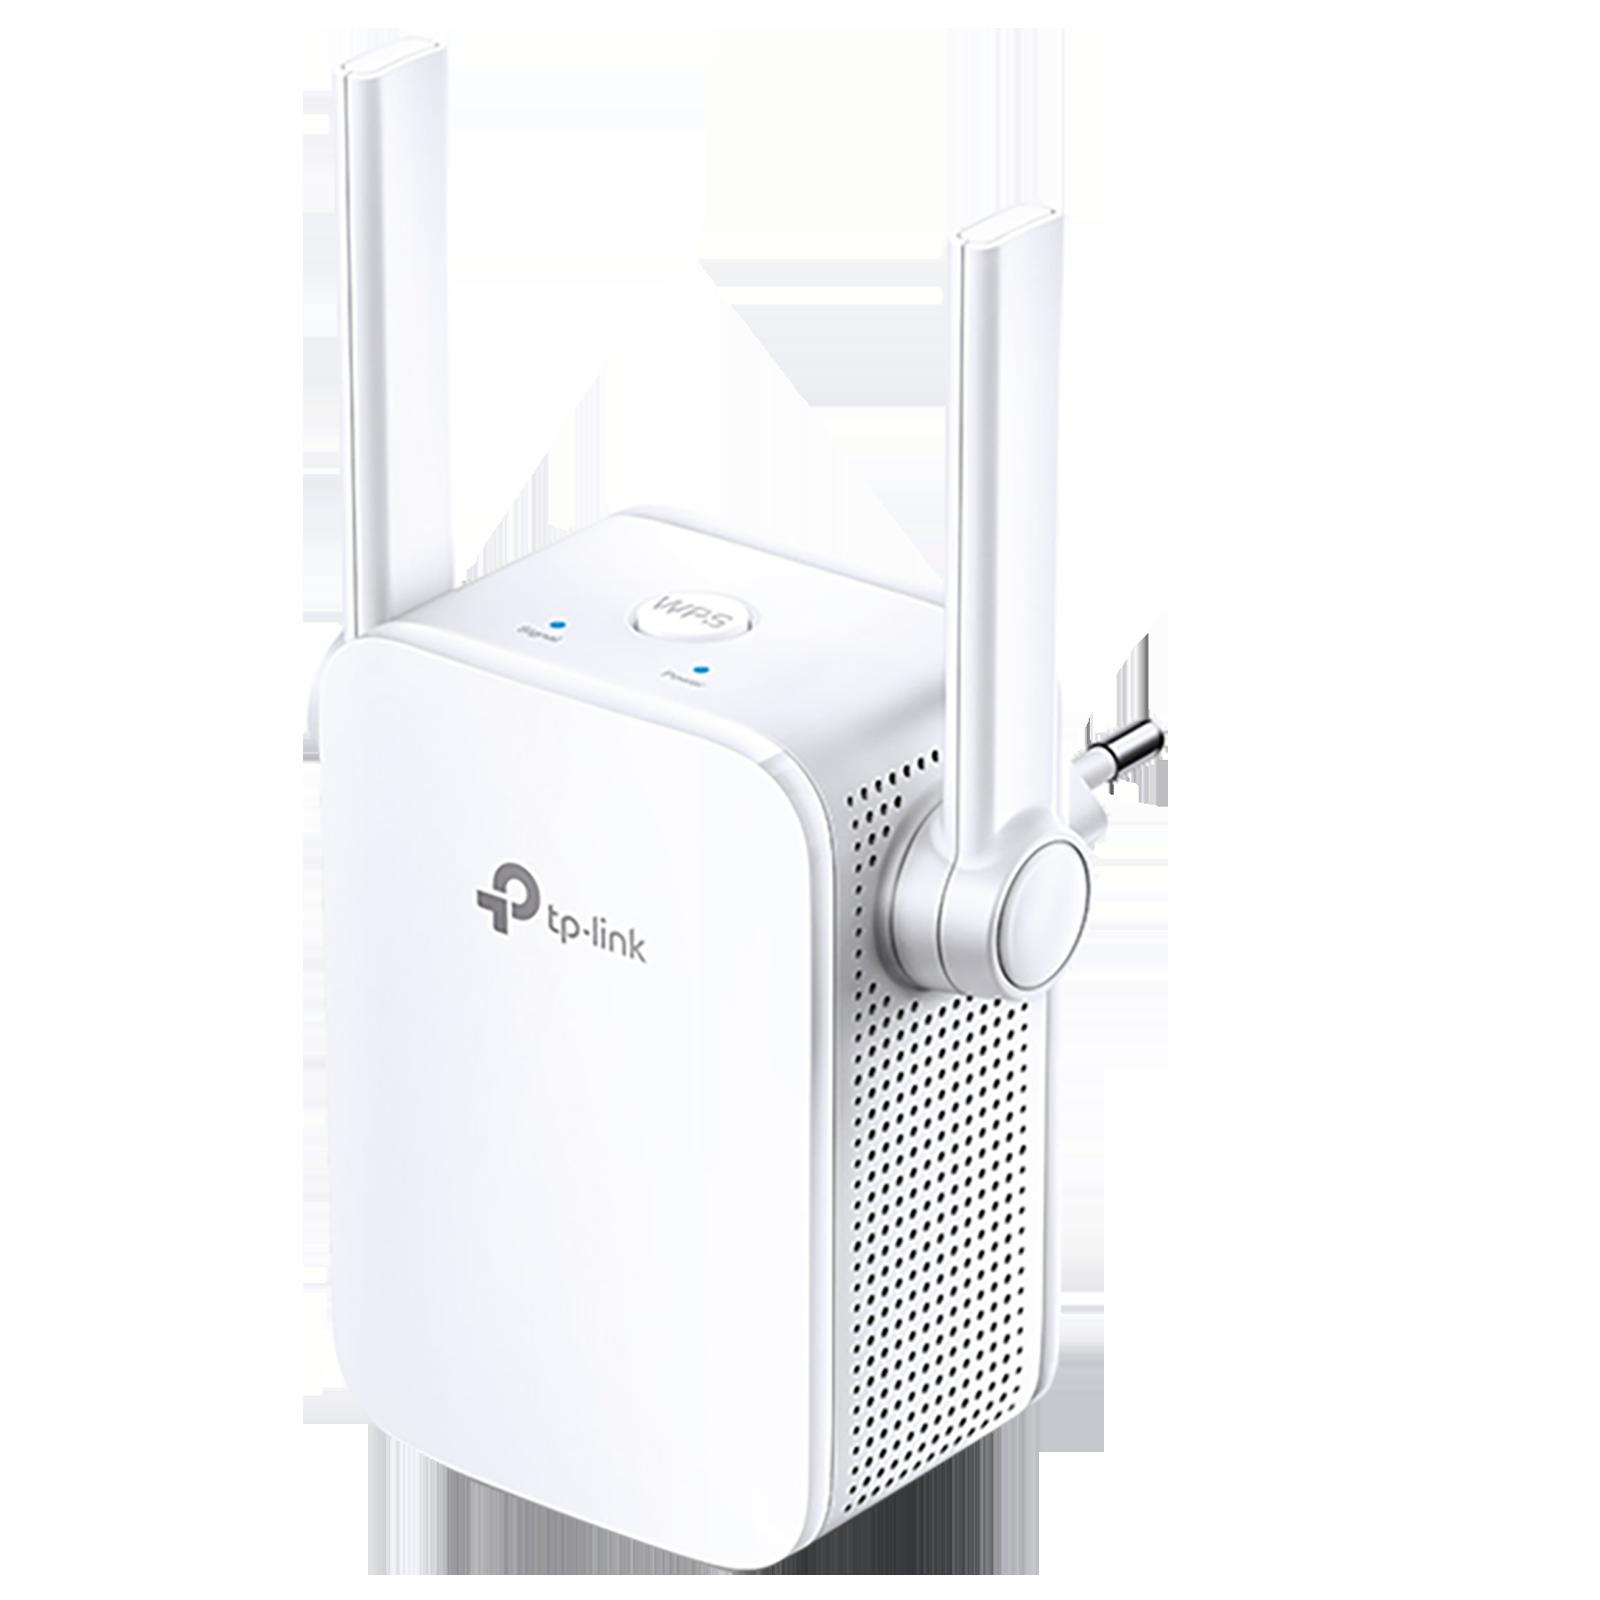 Tp-Link TL-WA855RE V4 N300 Single Band Wi-Fi Range Extender (Easy Monitoring, 153500482, White)_1